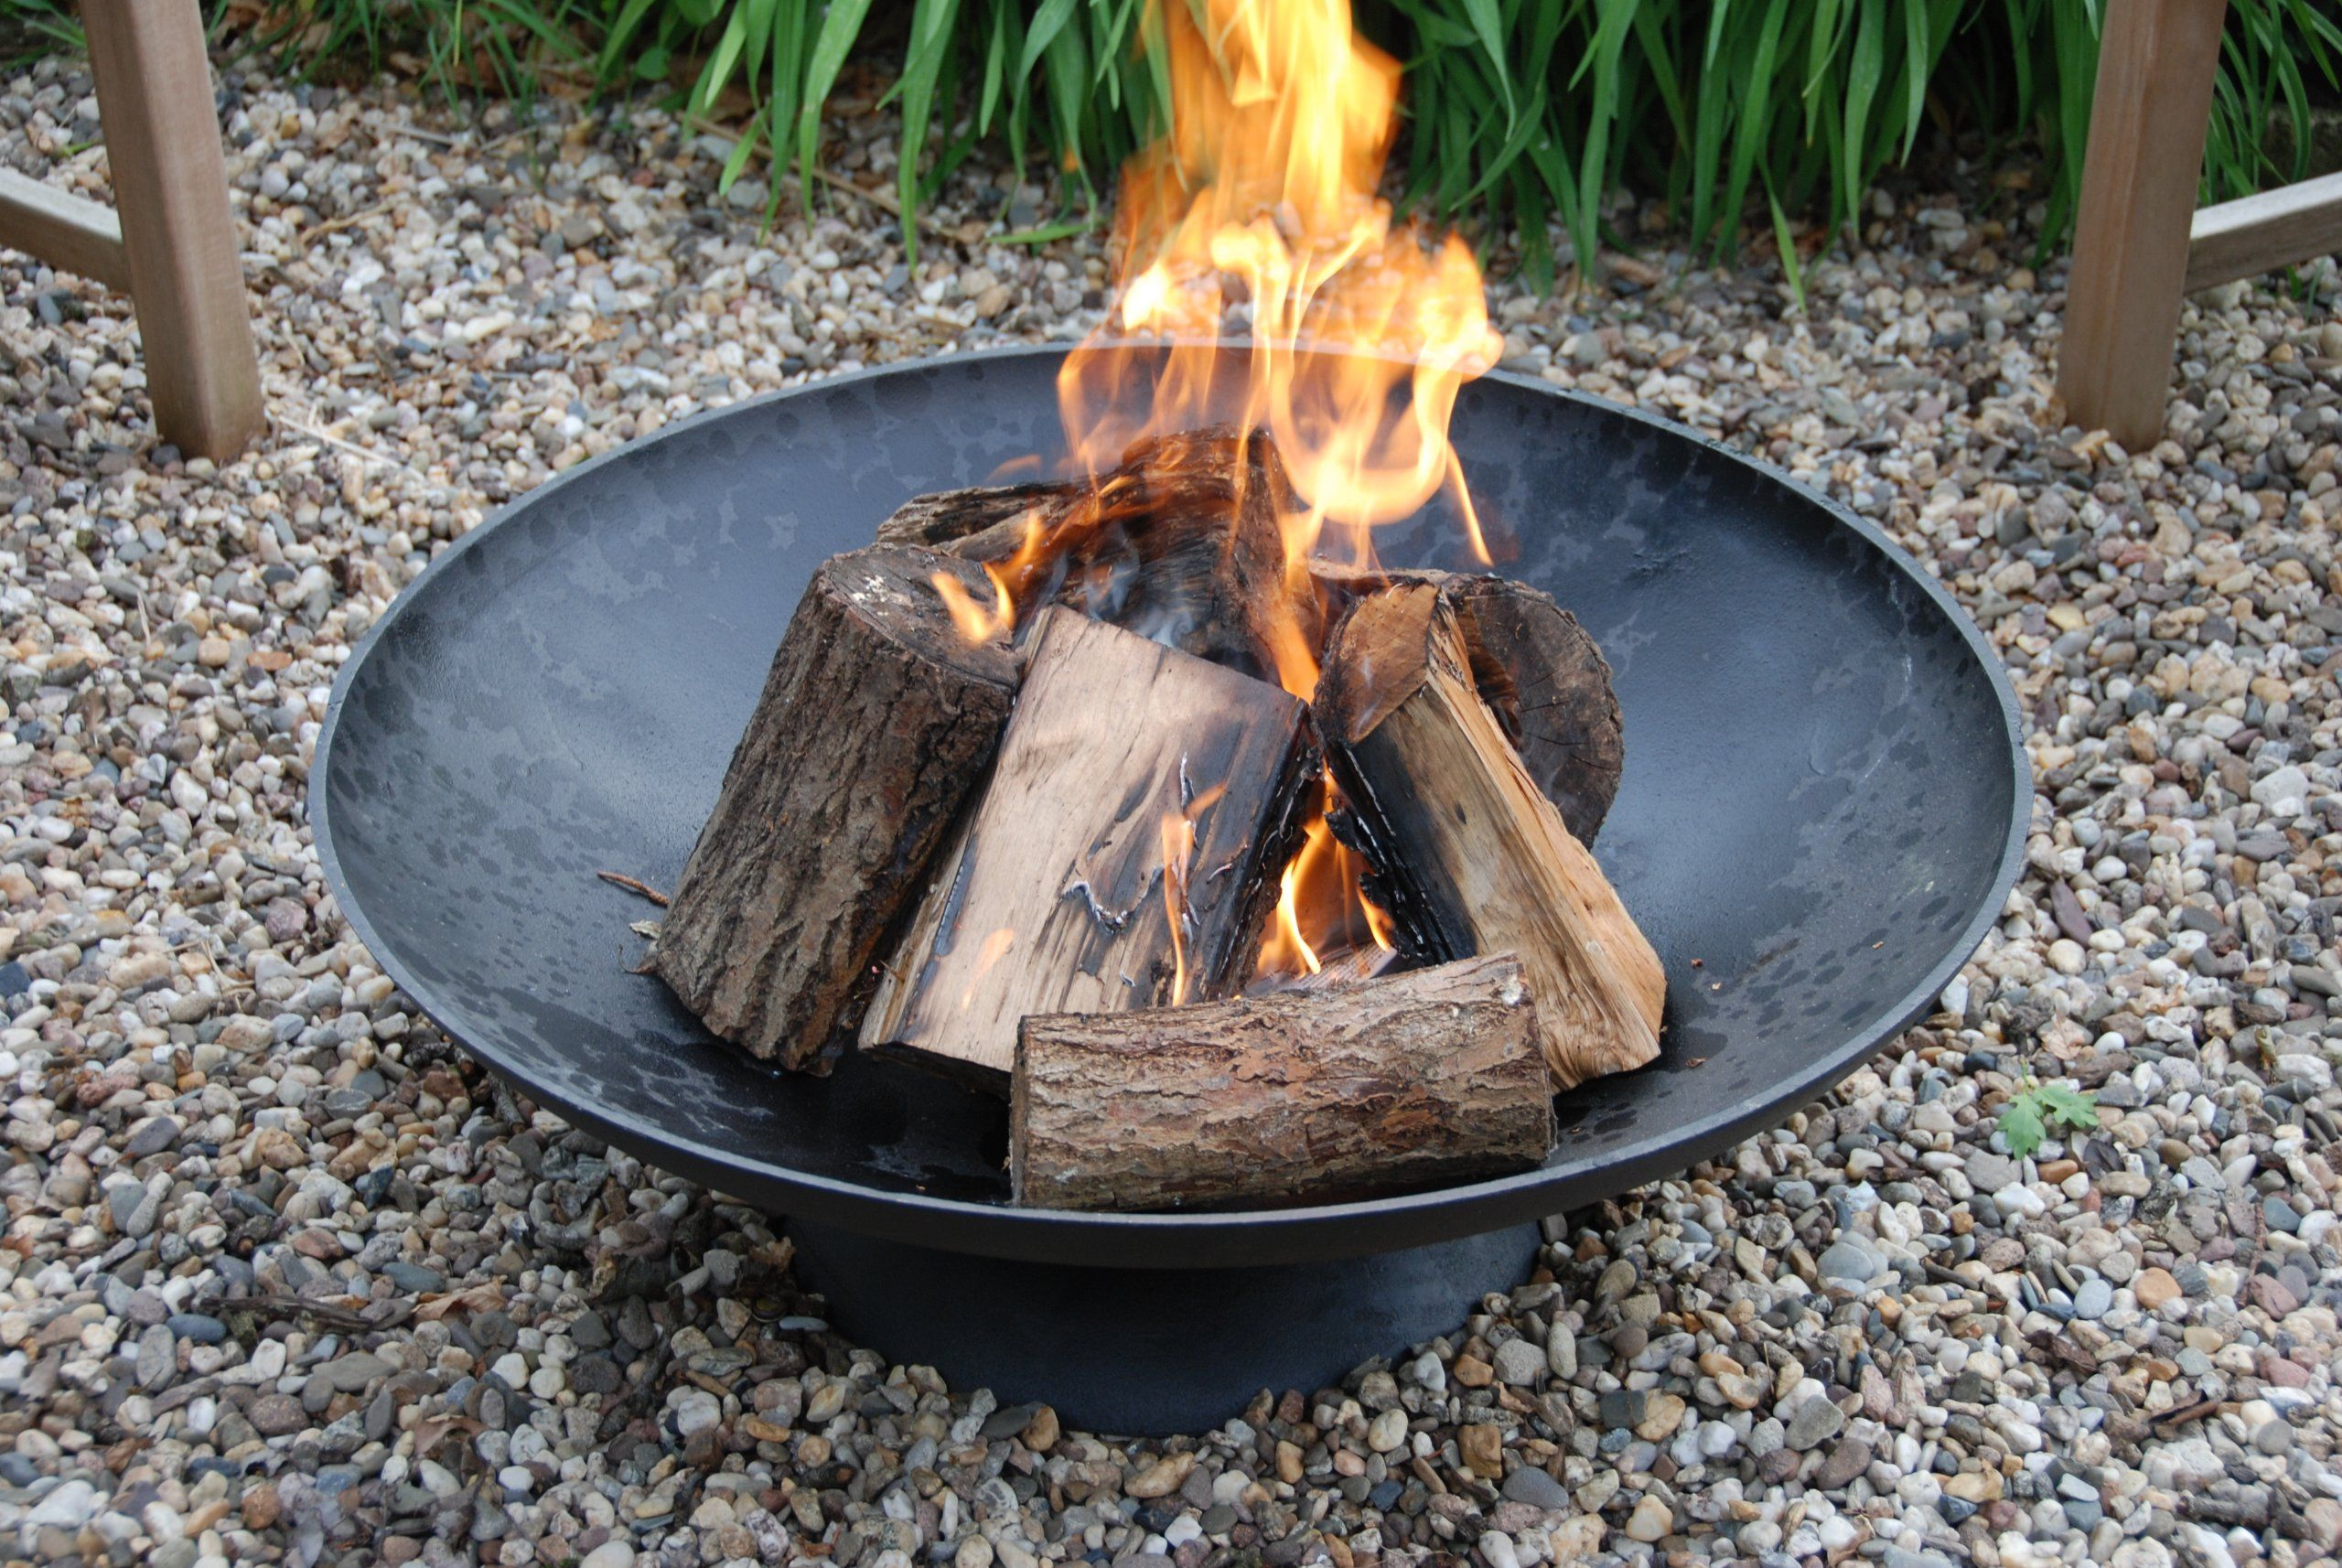 269 Amazon Prime Esschert Design Ff90 Fire Bowl X Large Outdoor Fireplaces Patio Lawn Garden Fire Bowls Fire Pit Patio Garden Furniture Design